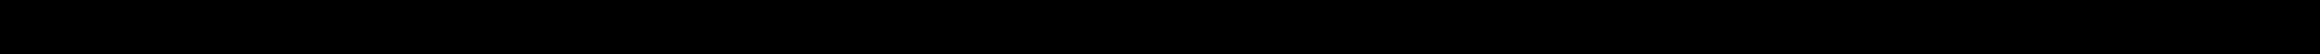 ATE 23623, 23624, 602713, 34 21 6 767 145, 34 21 6 767 146 Σετ τακάκια, δισκόφρενα